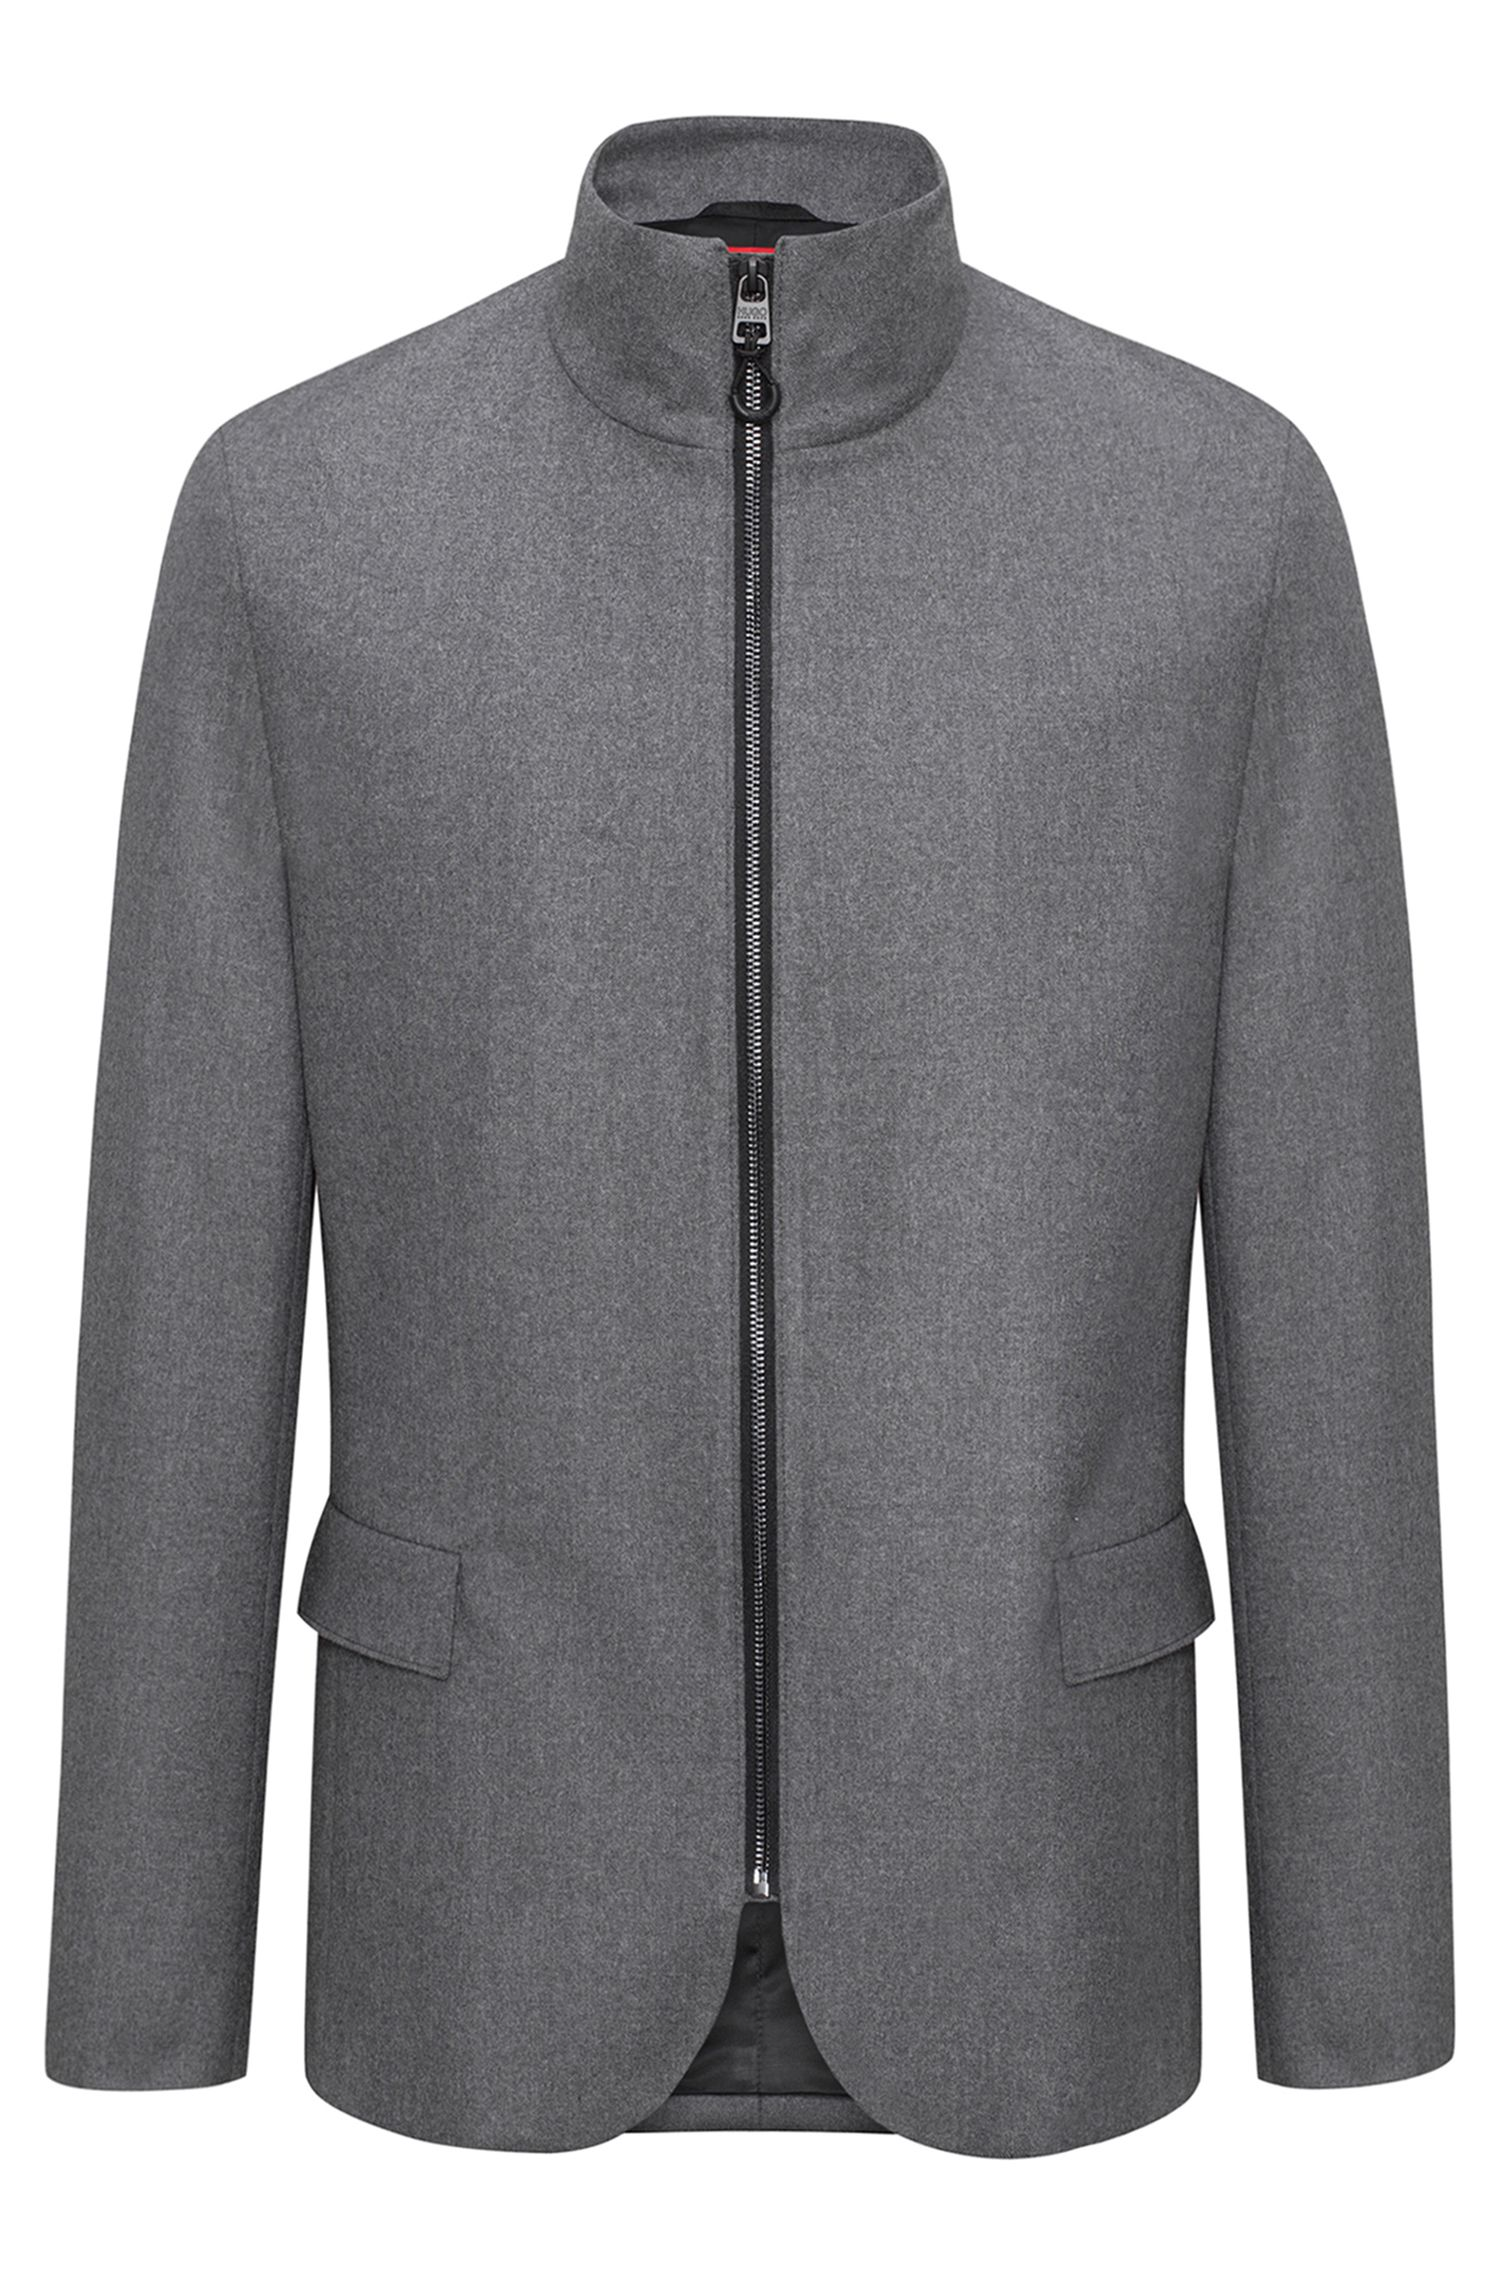 Giacca regular fit in misto lana con zip integrale